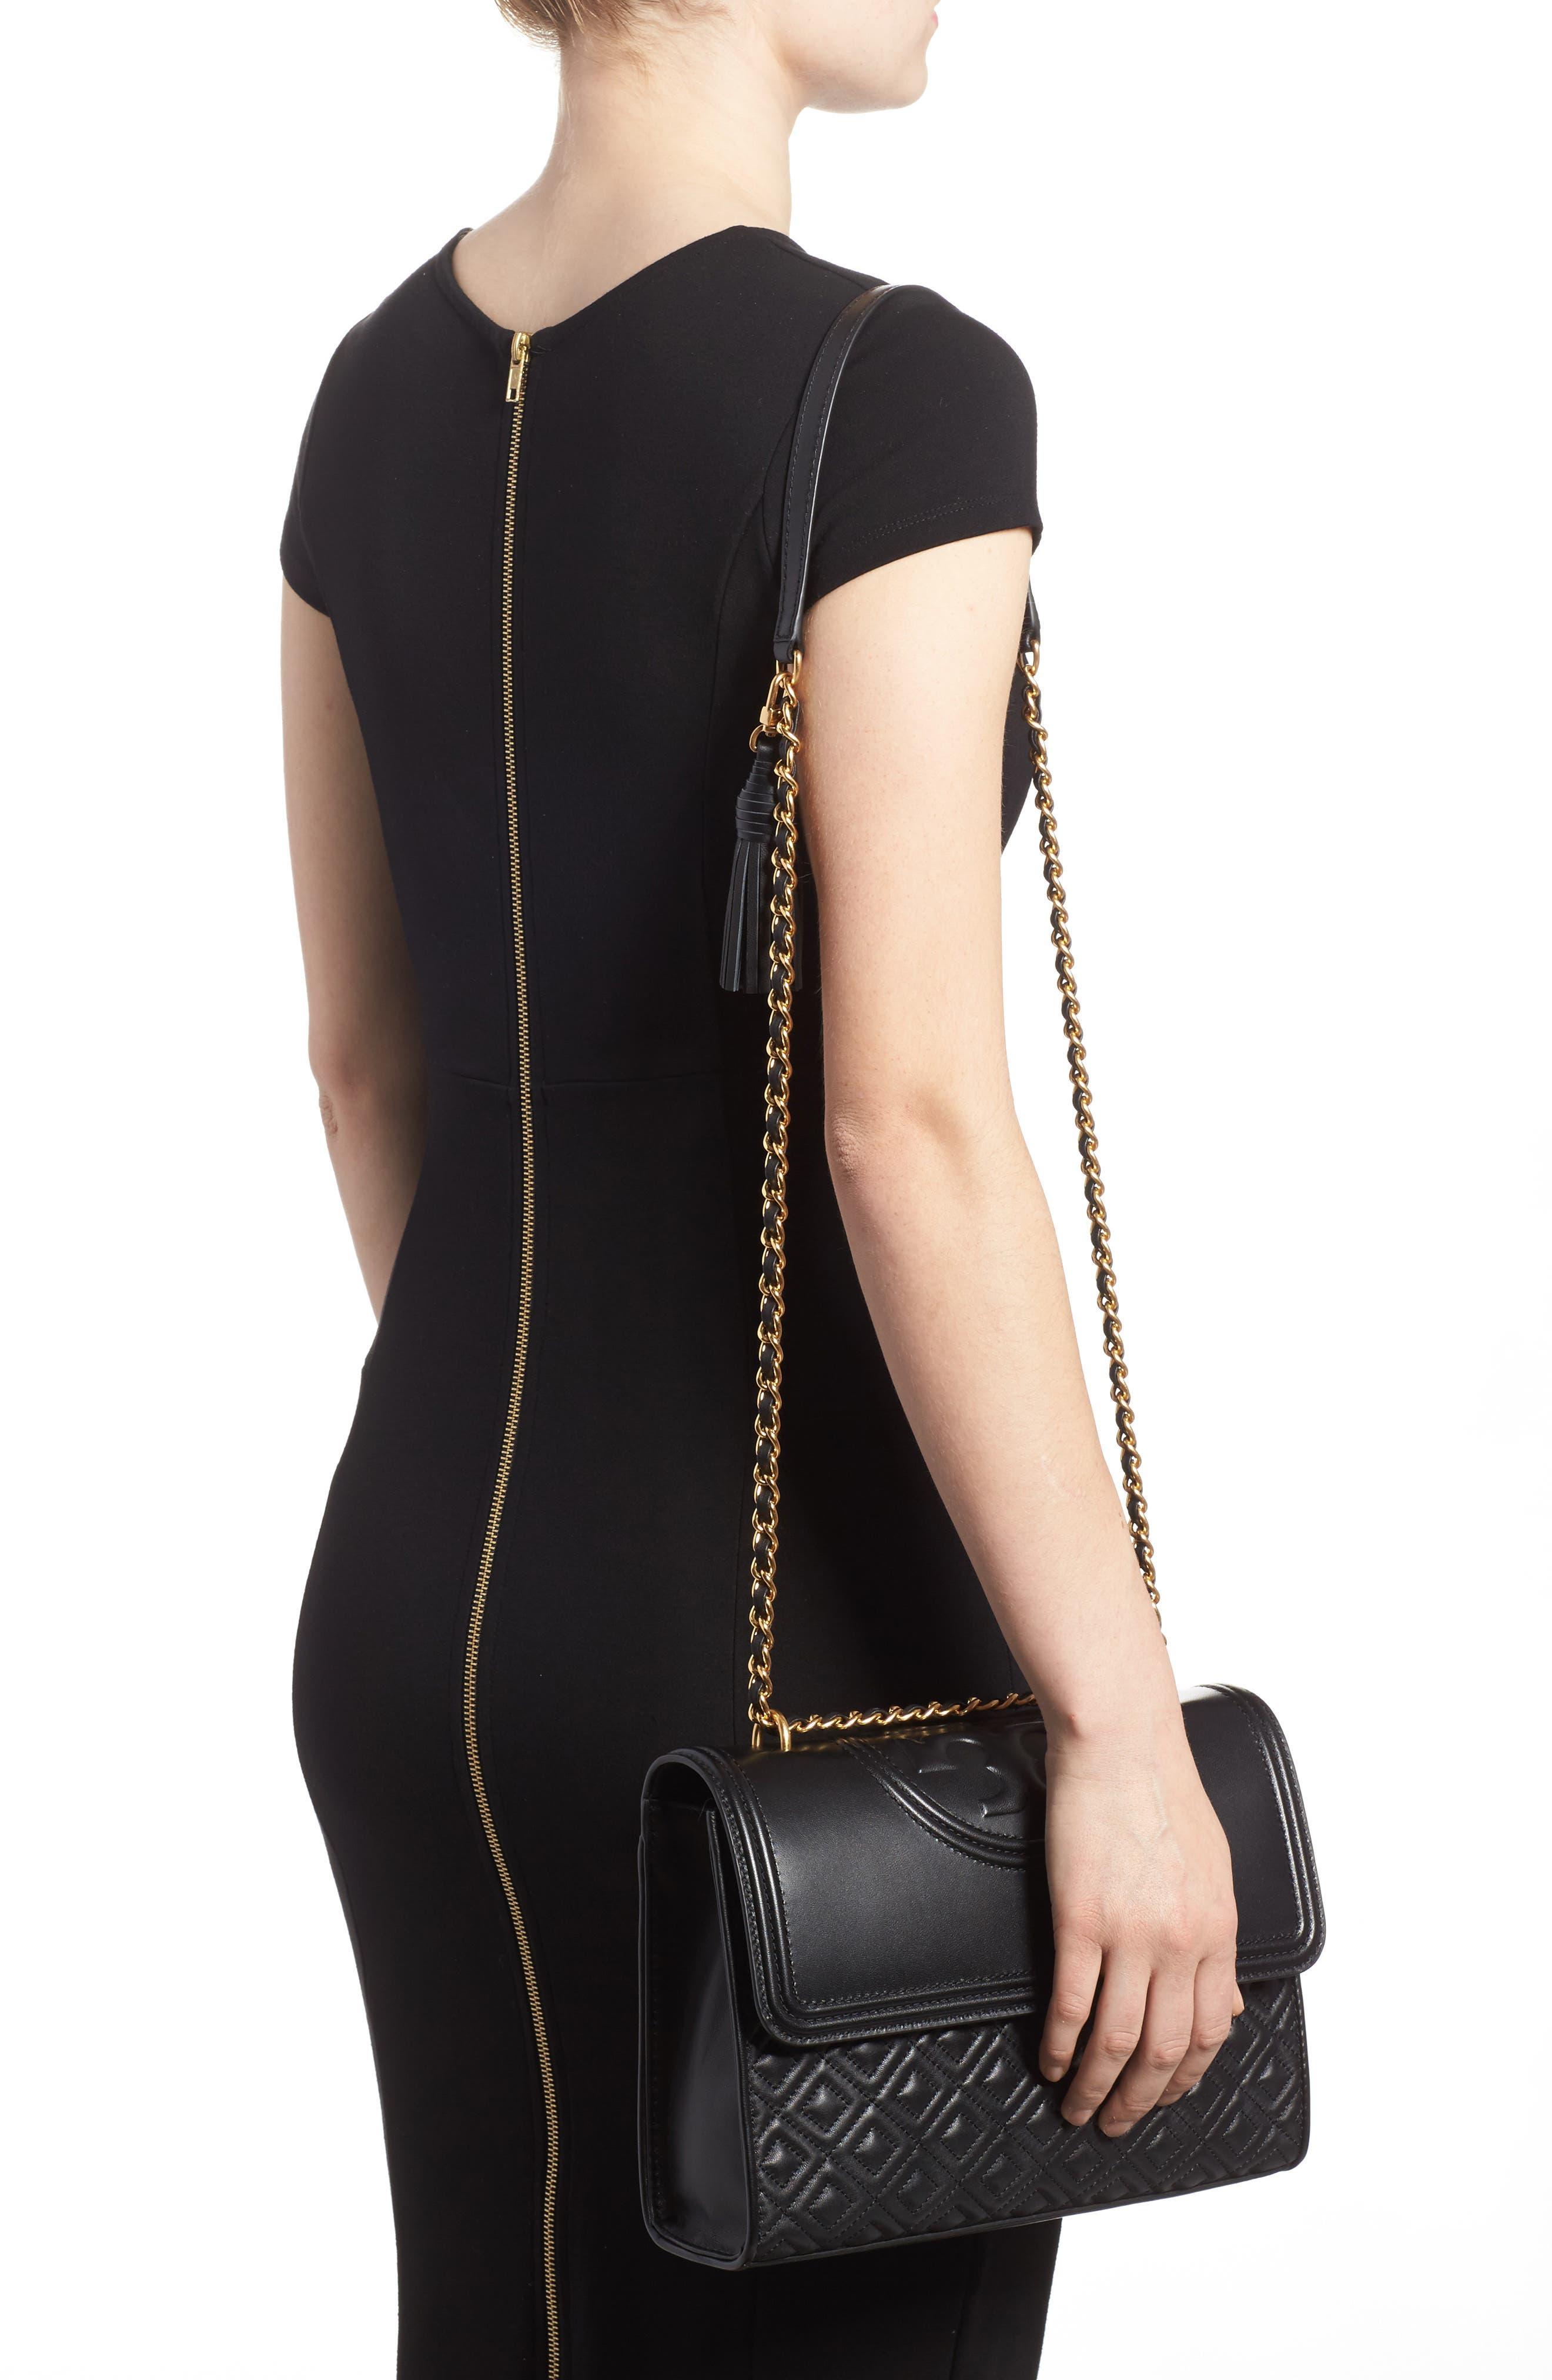 TORY BURCH, Fleming Leather Convertible Shoulder Bag, Alternate thumbnail 2, color, BLACK